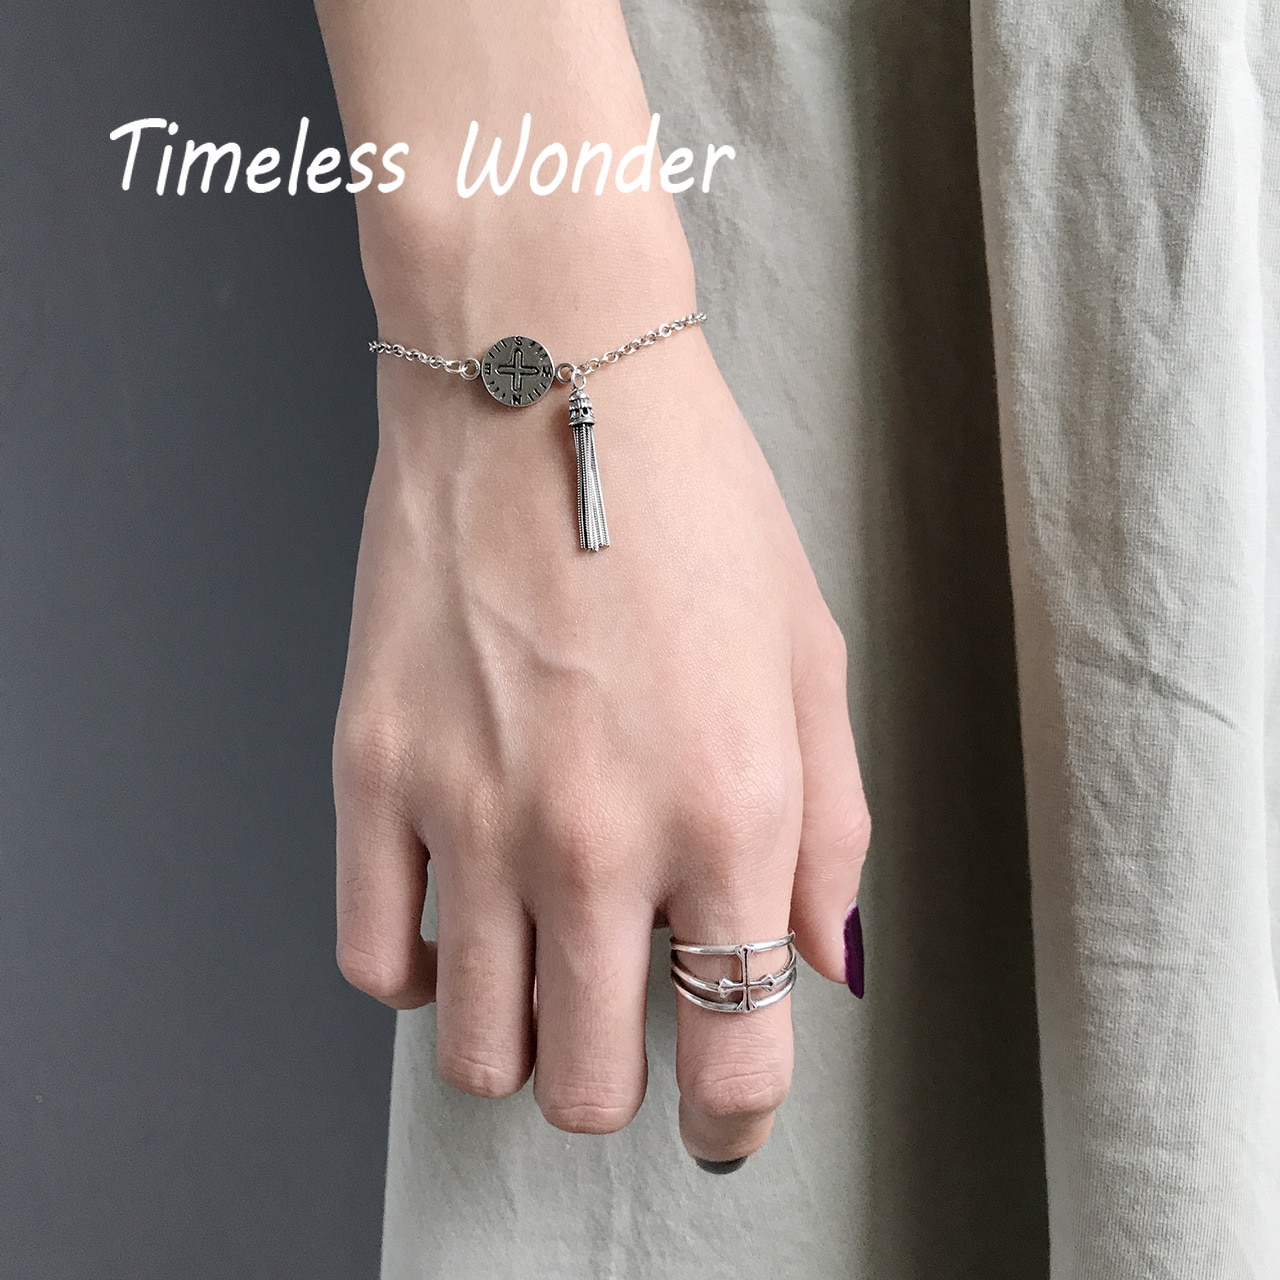 Timeless Wonder 925 Sterling Silver Retro tassel cross coin Charm Bracelet Women Jewlery Punk Gothic Gown Gift Ins Boho 5597